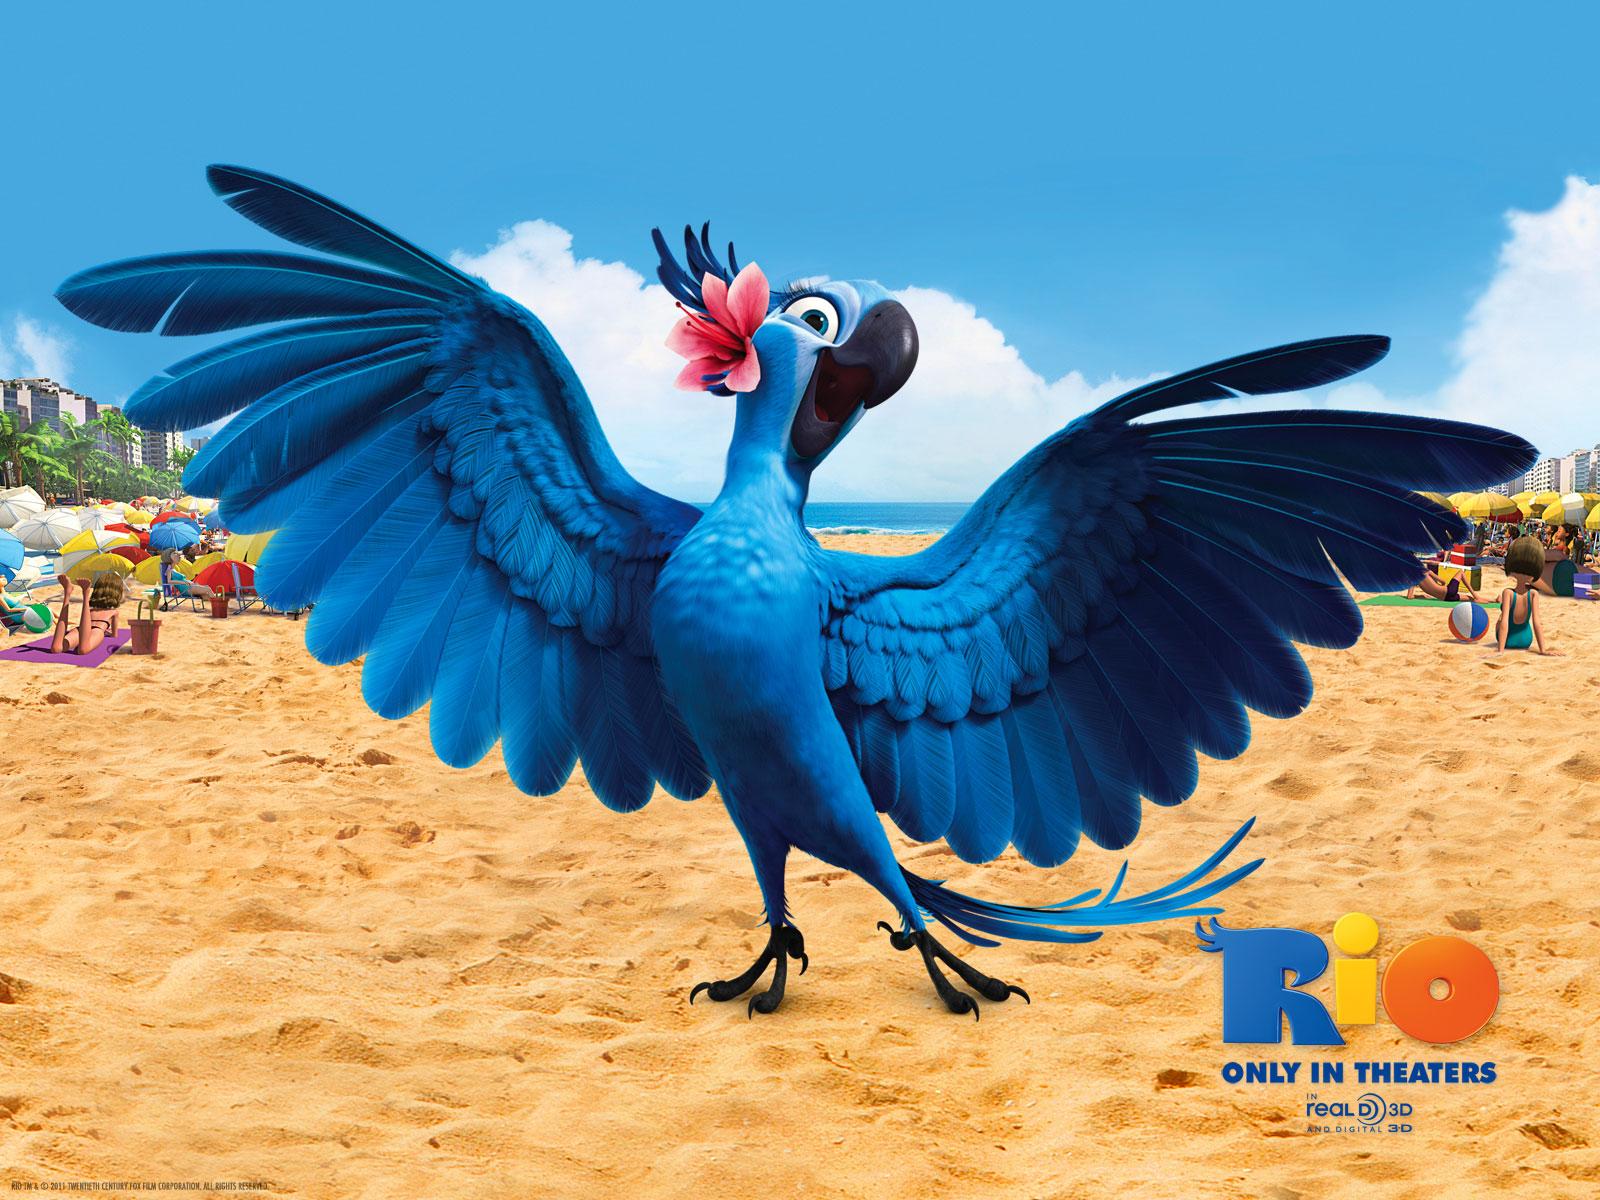 WallpapersKu: Rio (Angry Bird) Movie Wallpapers